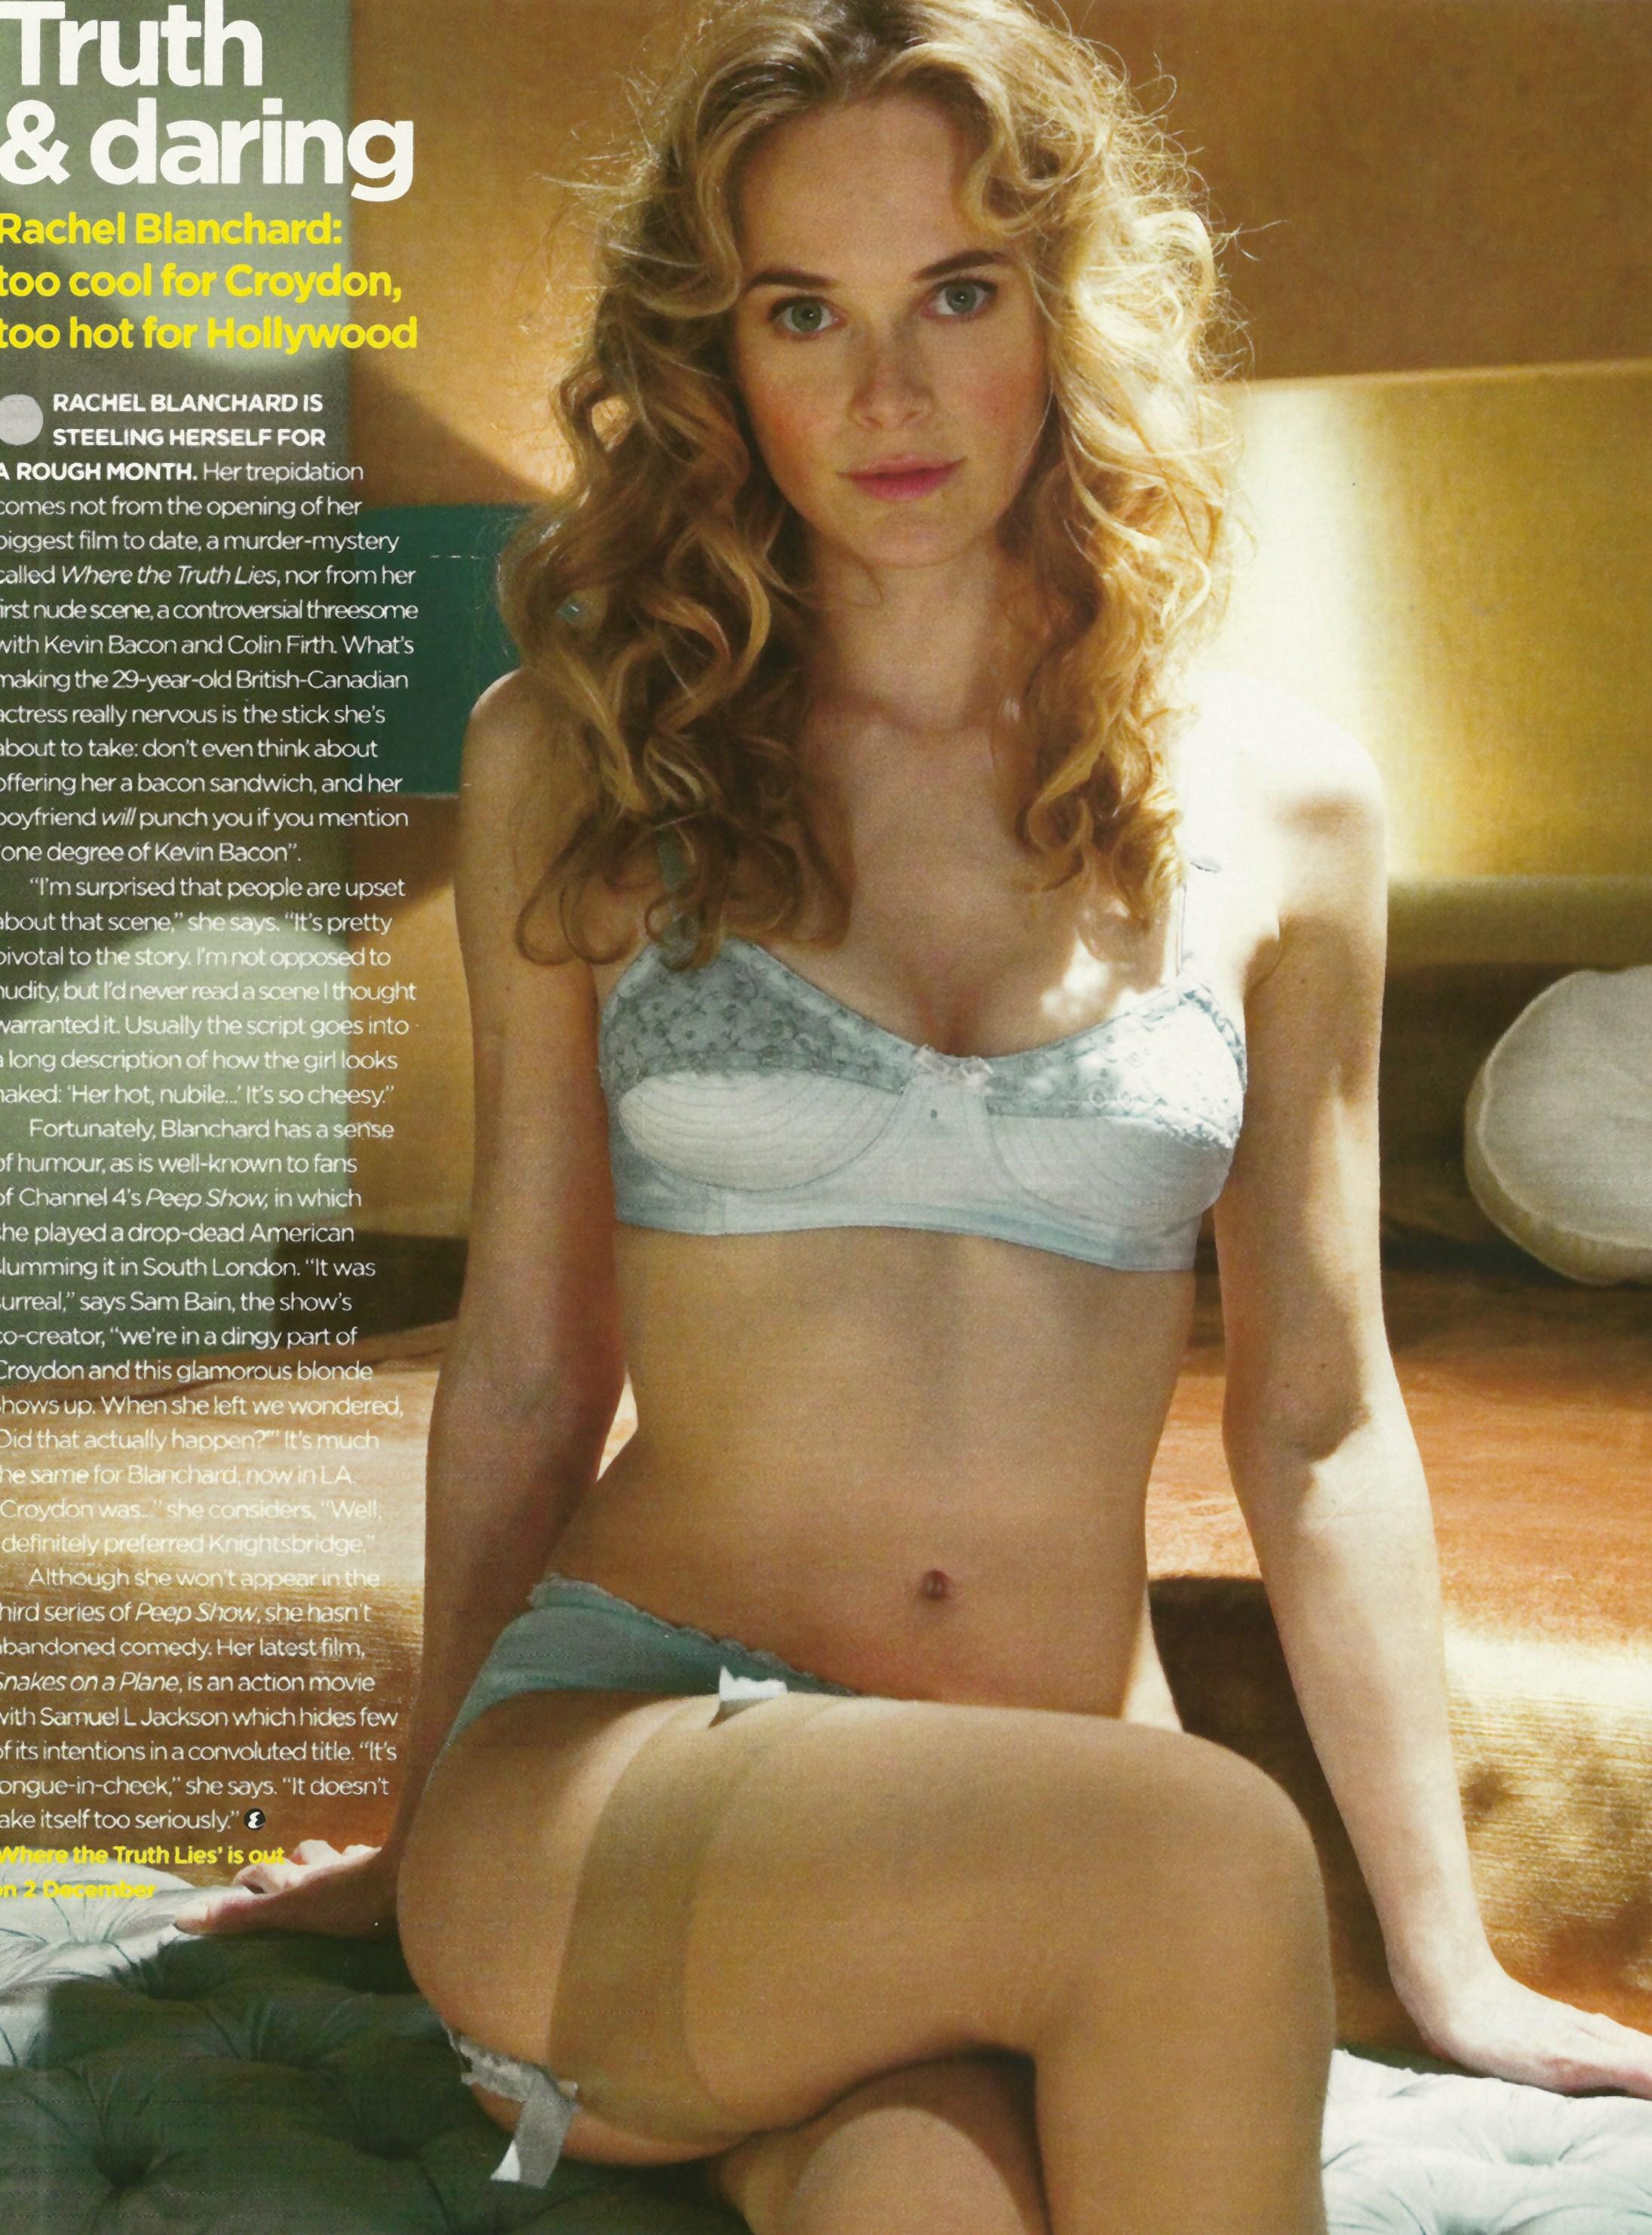 Rachel blanchard in bikini